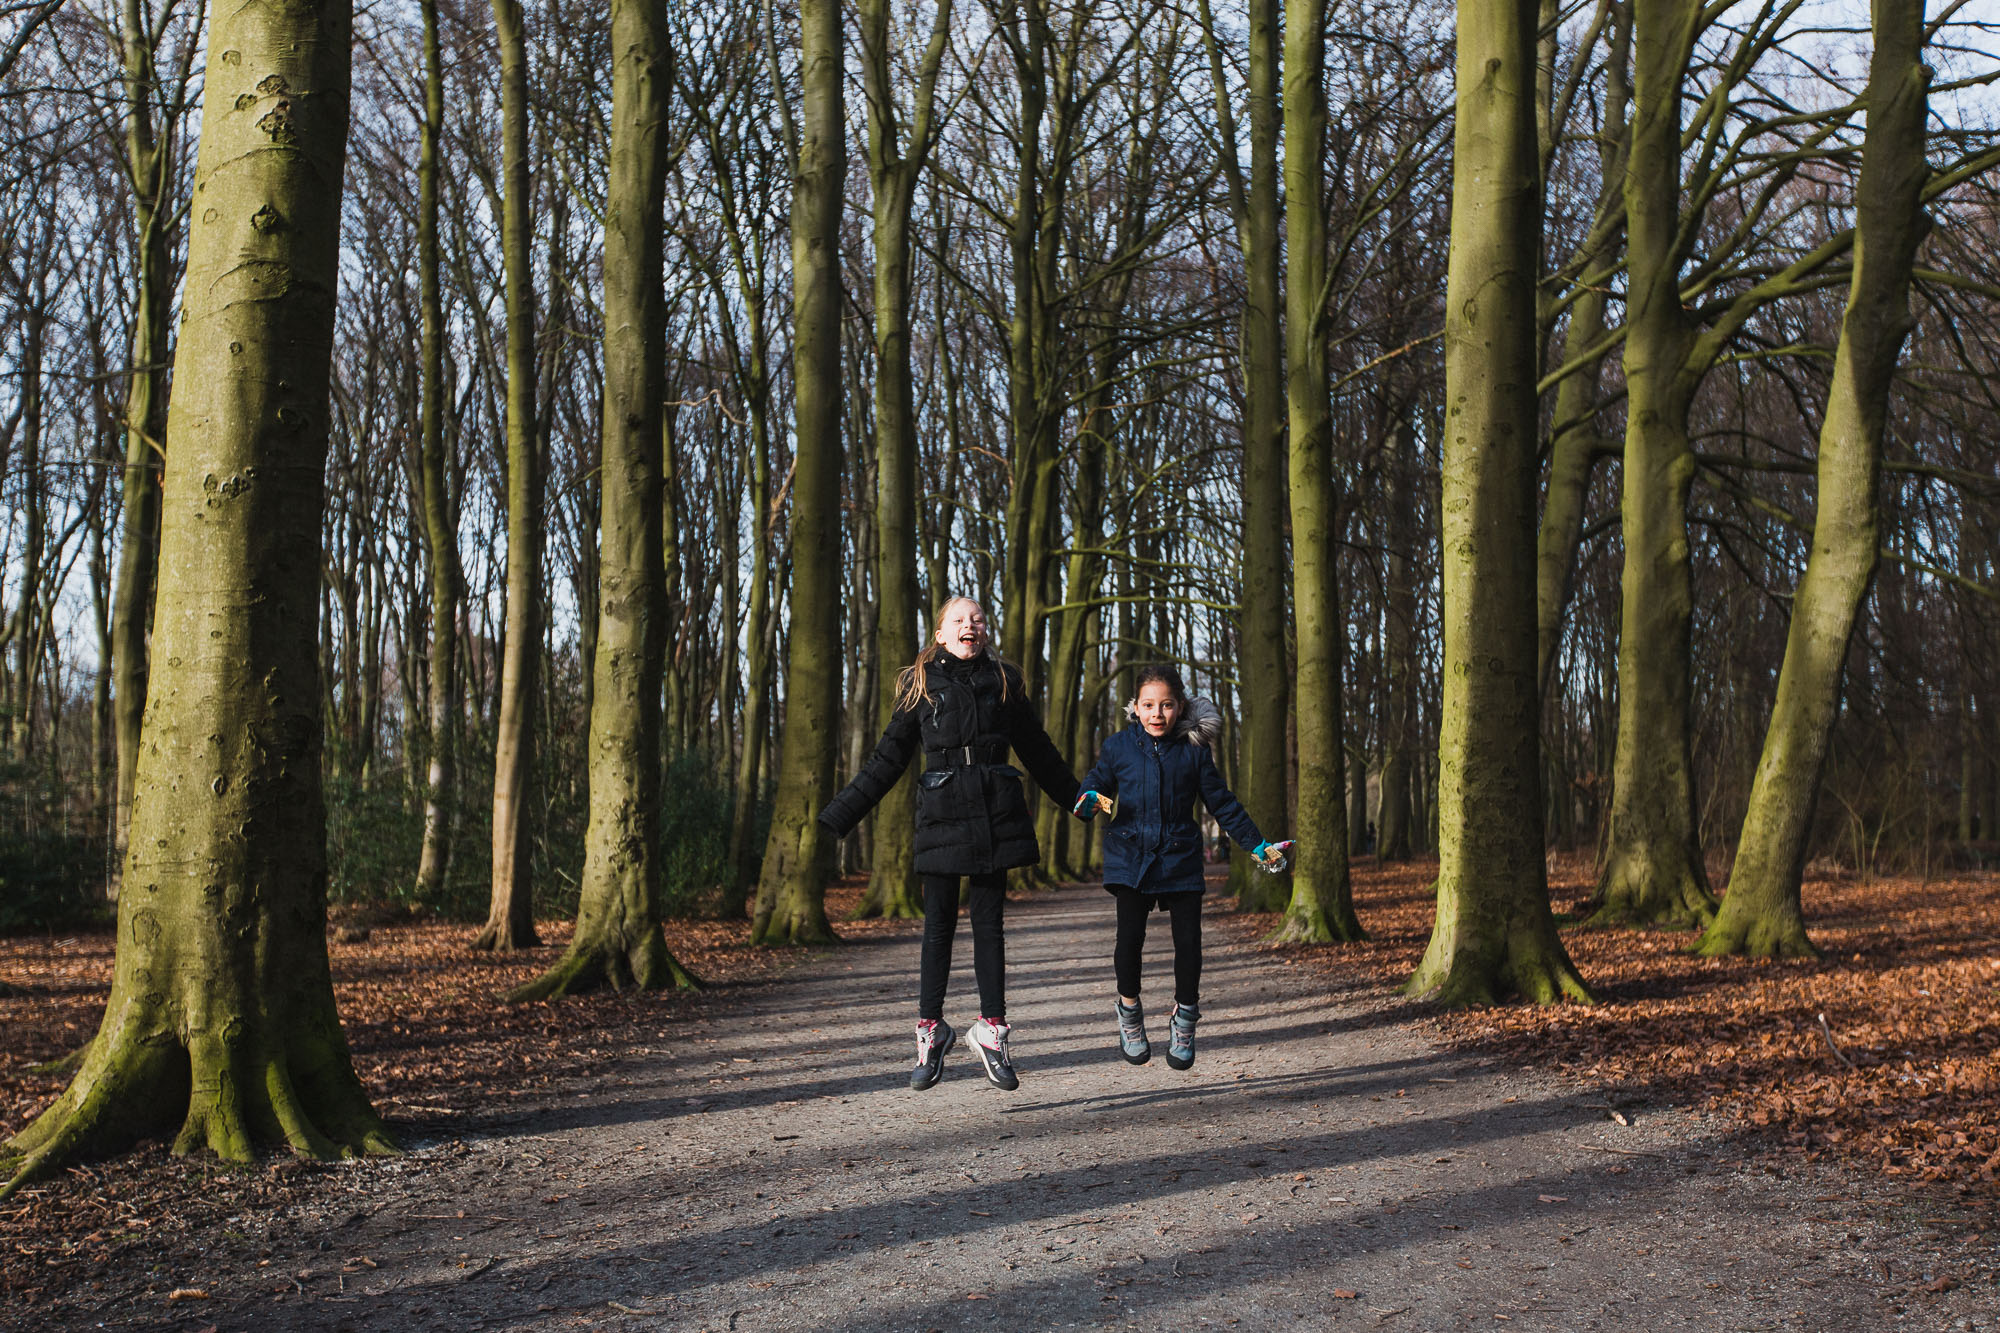 Jumping in the woods, Rijswijk